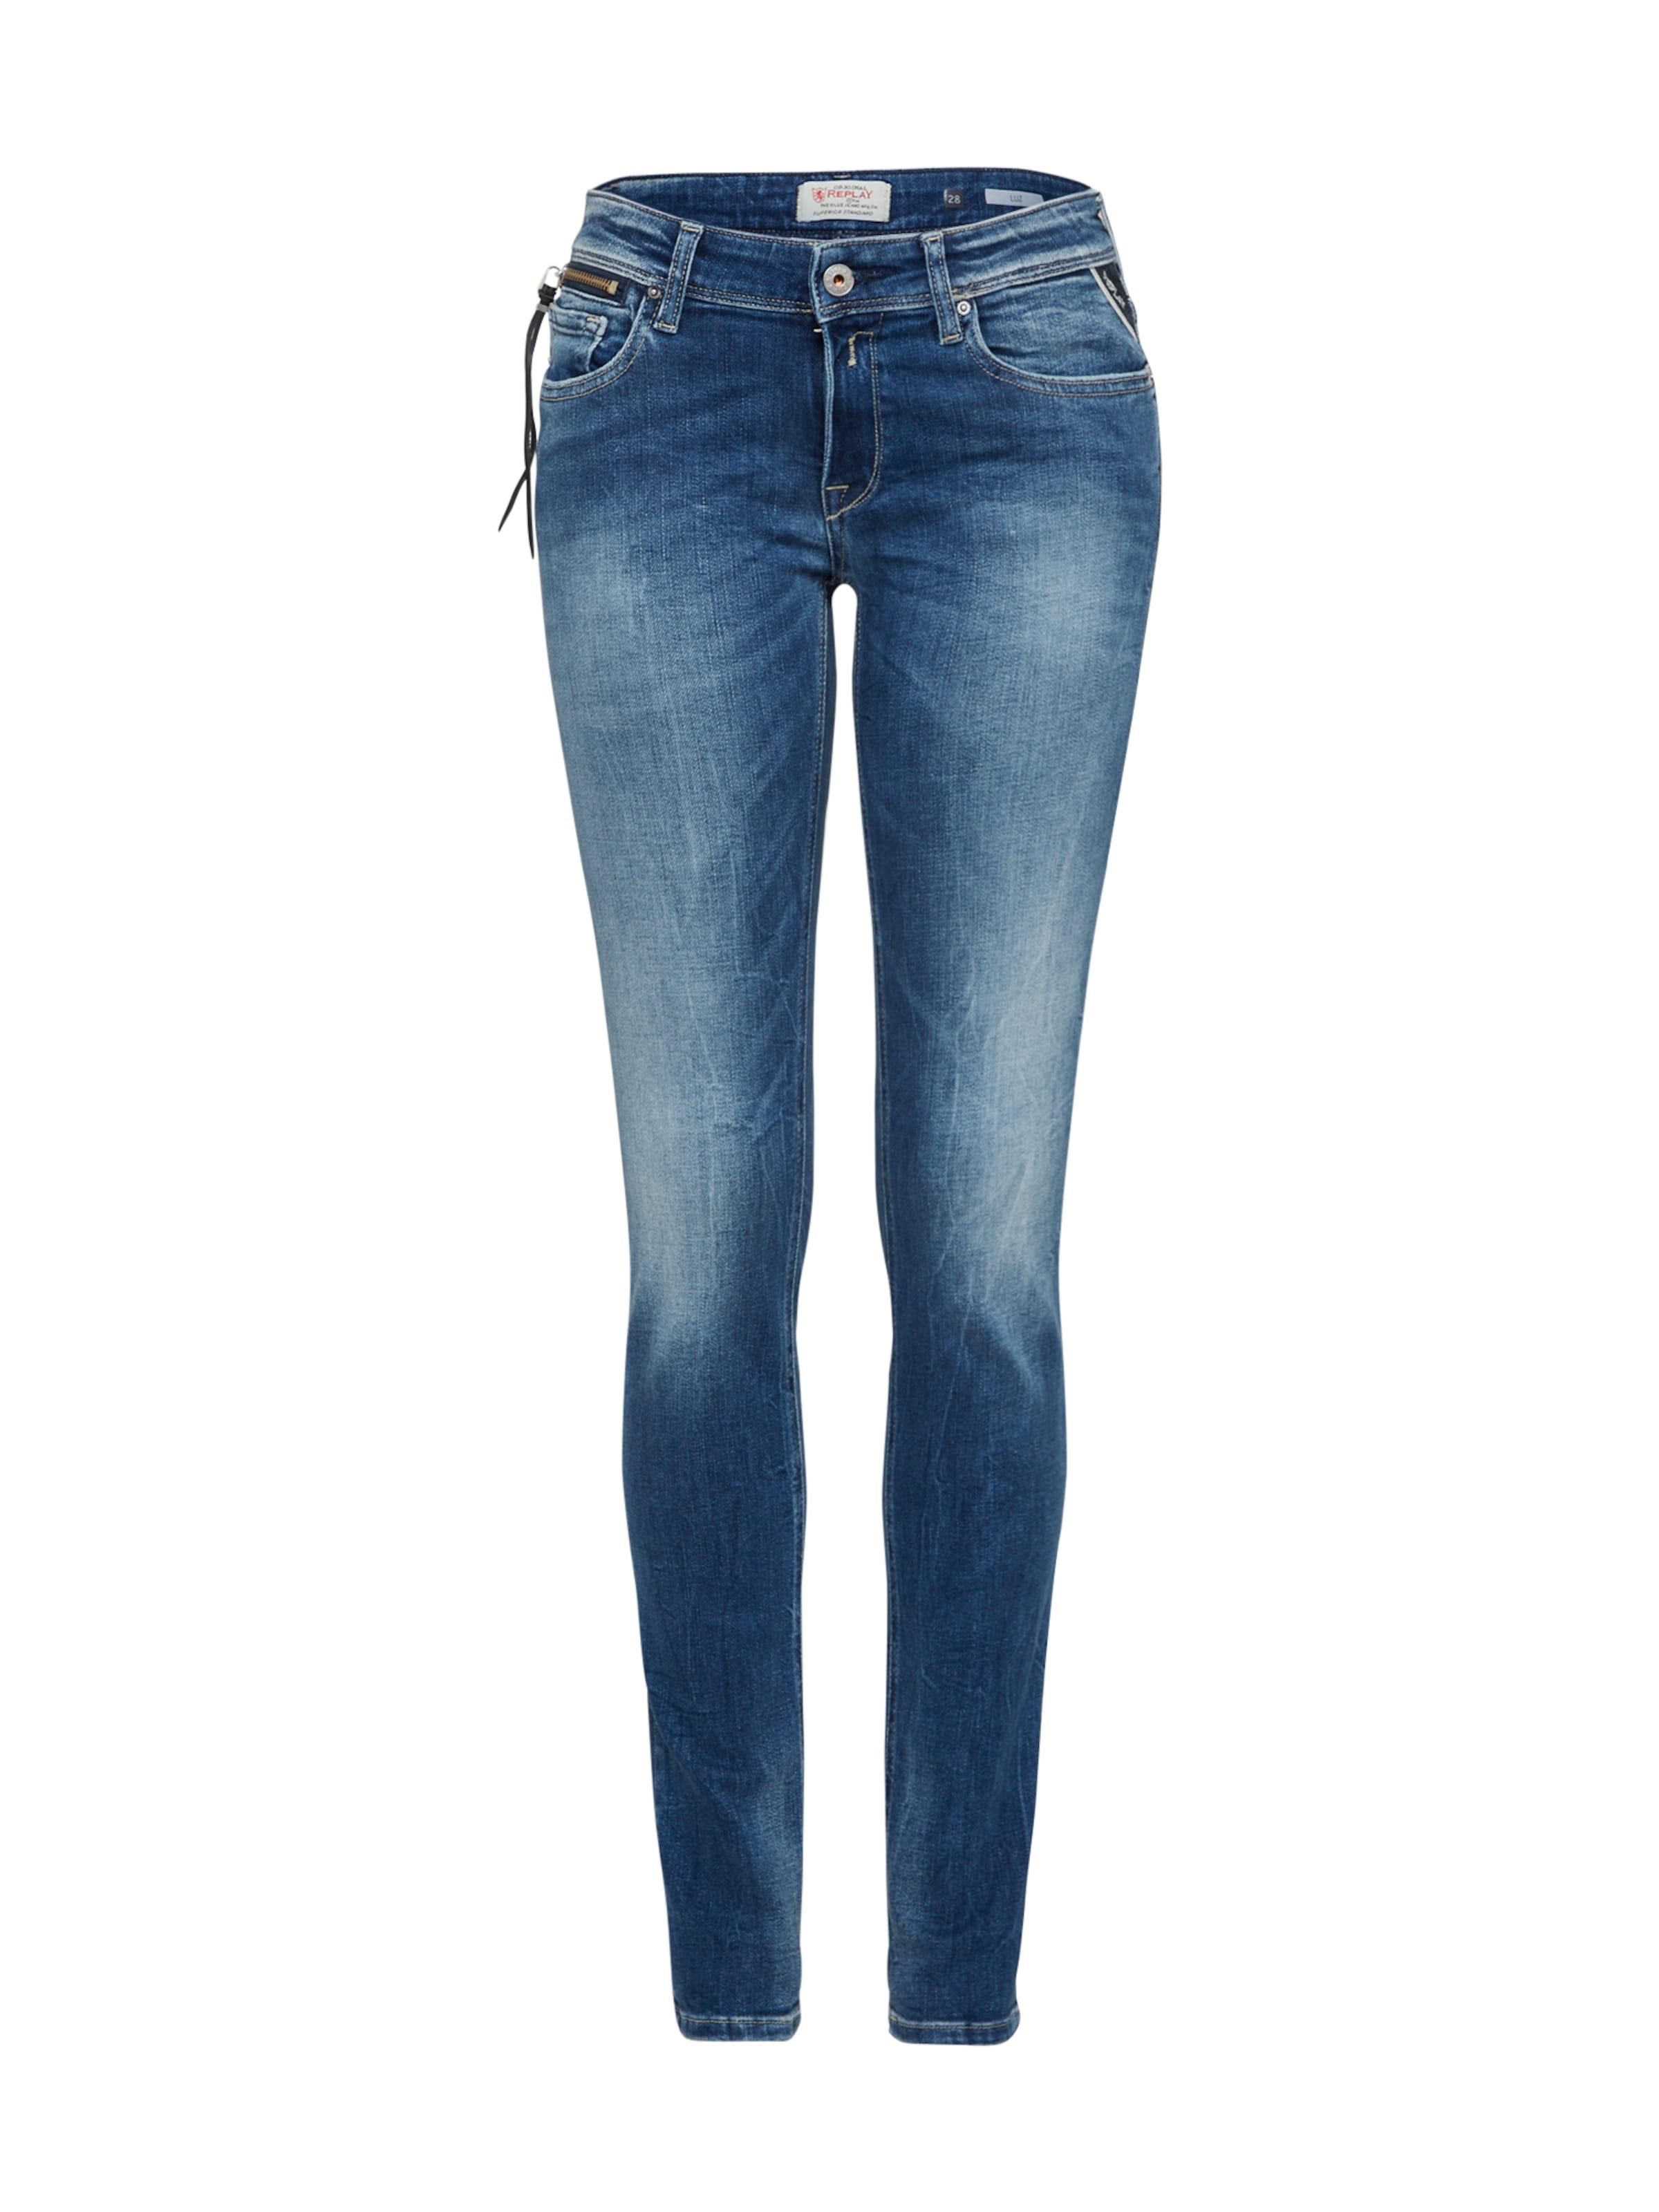 Jeans Denim In Replay 'luz' Blue sxdhtQrC